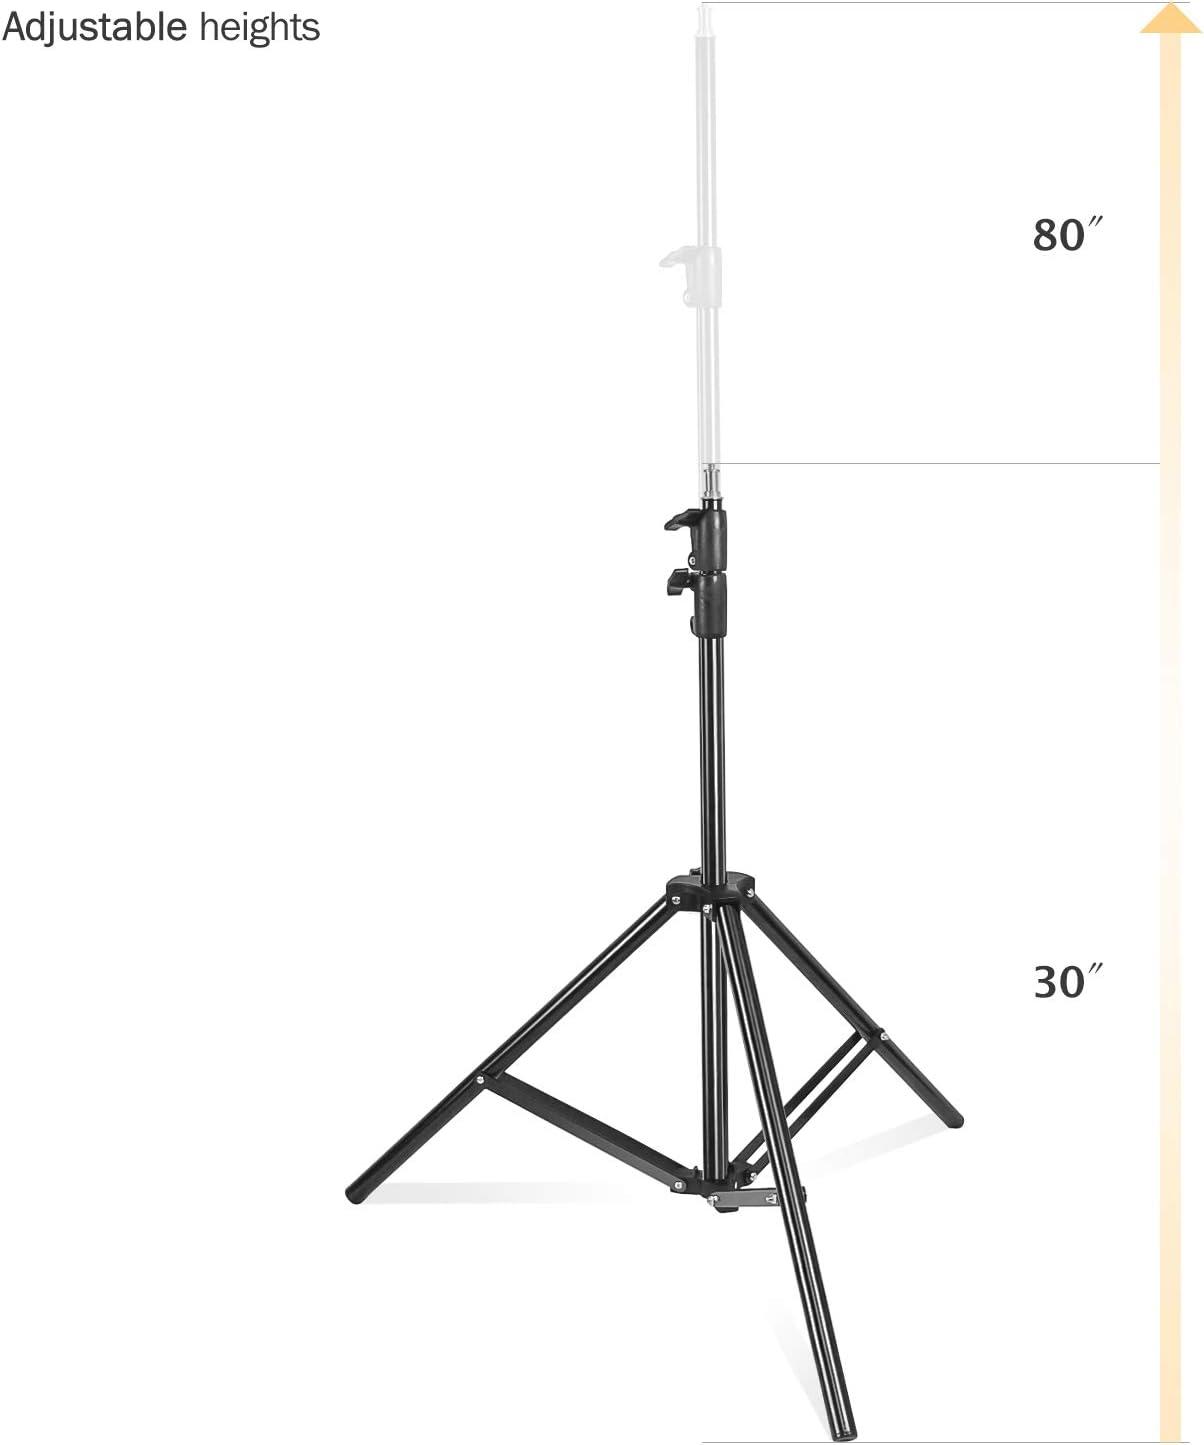 Backgrounds,JSAG498 Softboxes Julius Studio,86//7 Feet//218CM Photography Light Stands for Reflectors Umbrellas Lights